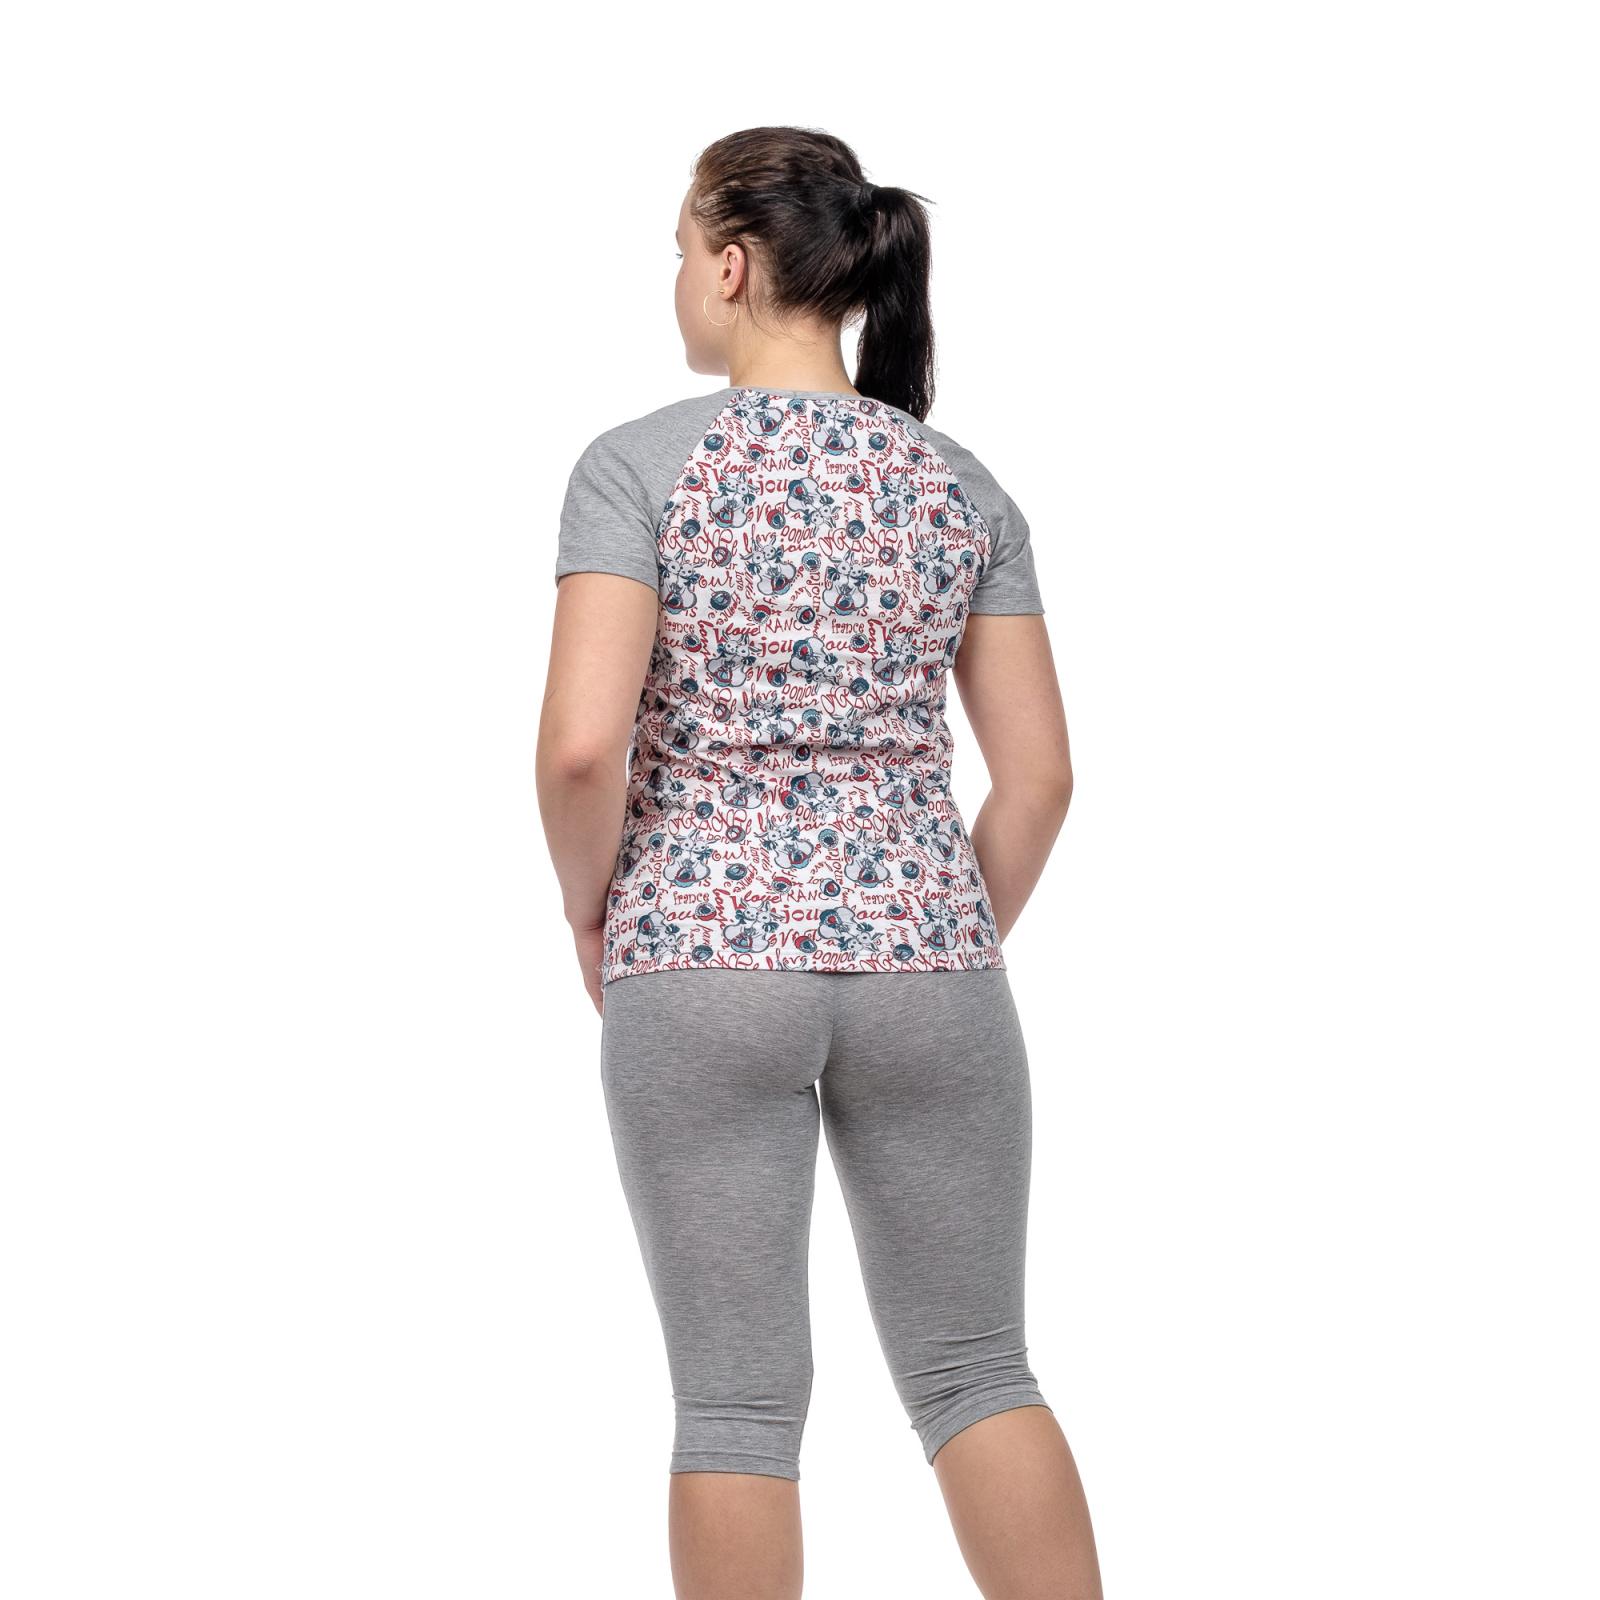 Пижама Зайки (футболка + бриджи) М-0124Б